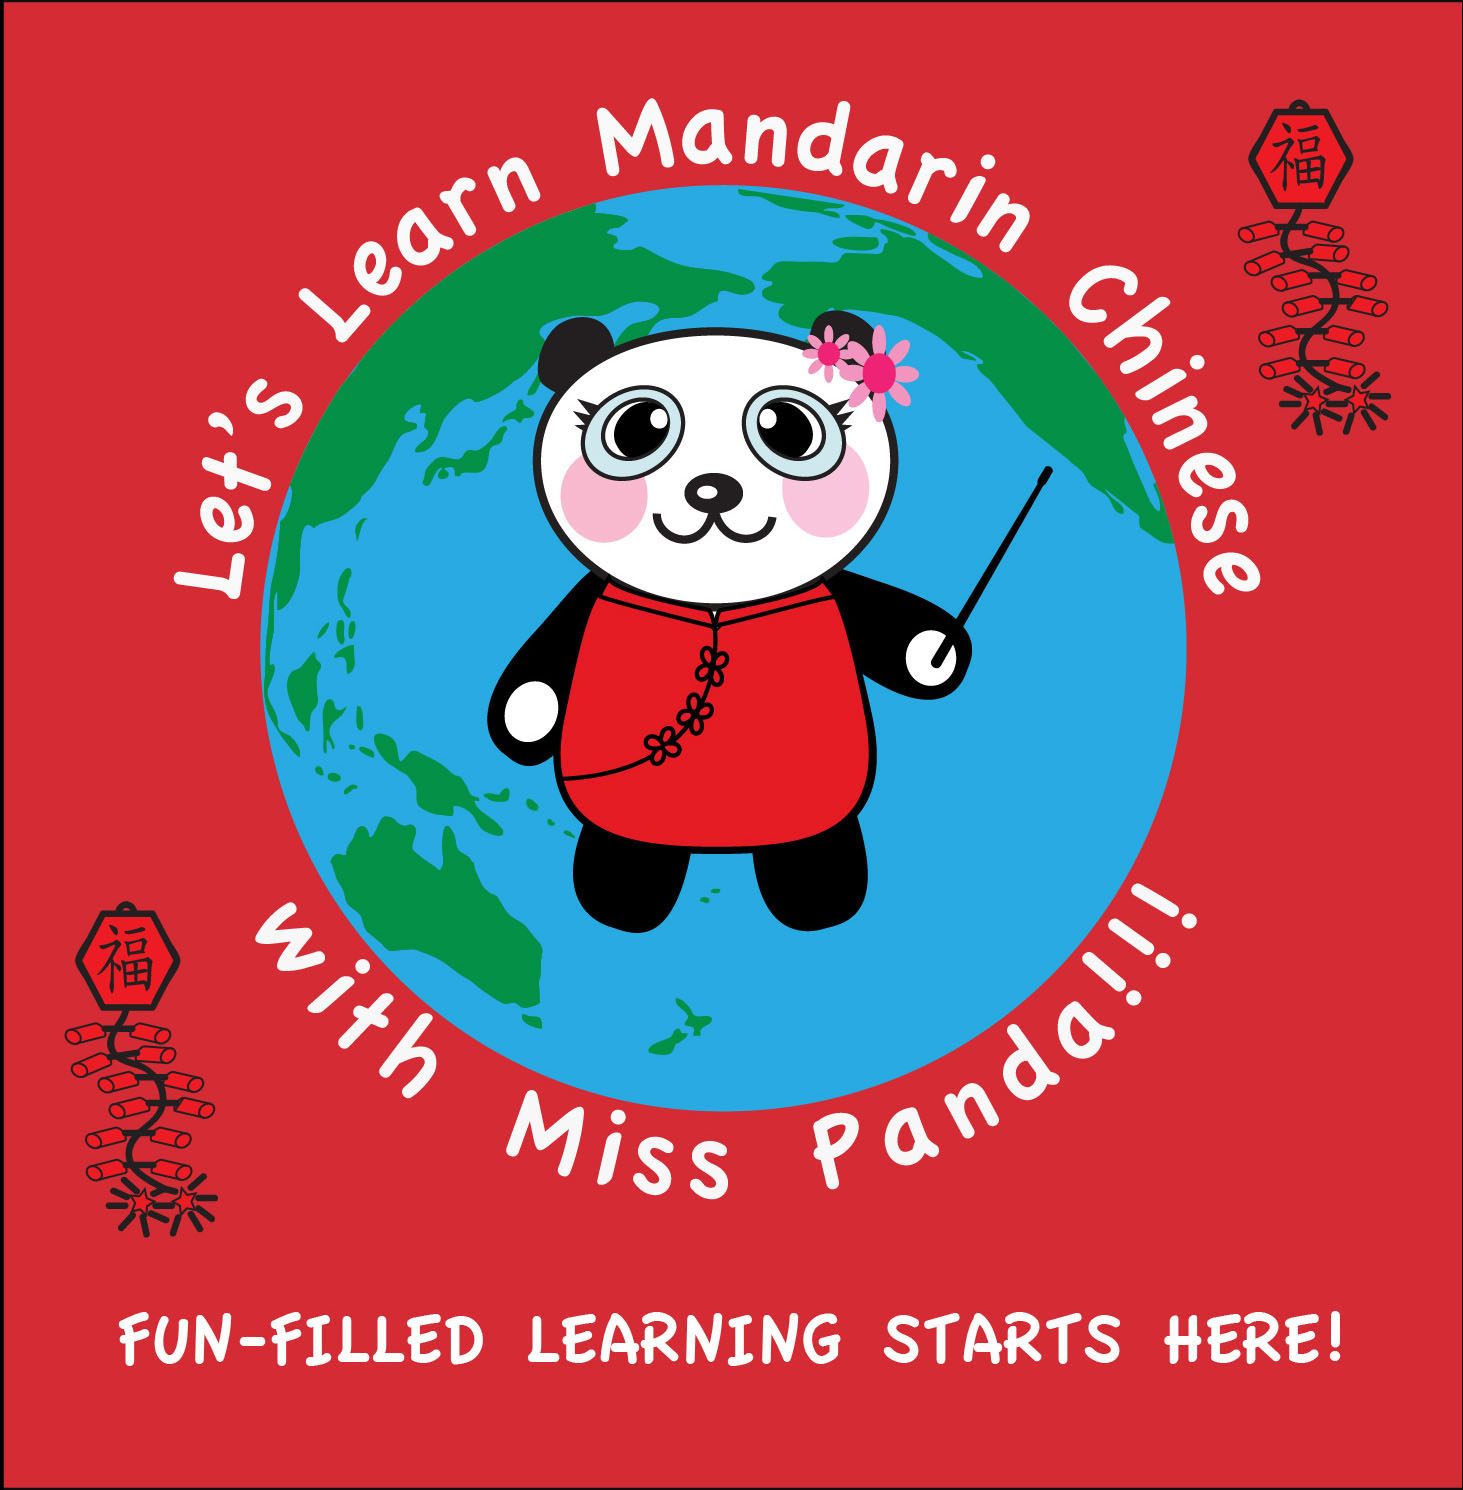 Miss Panda Chinese